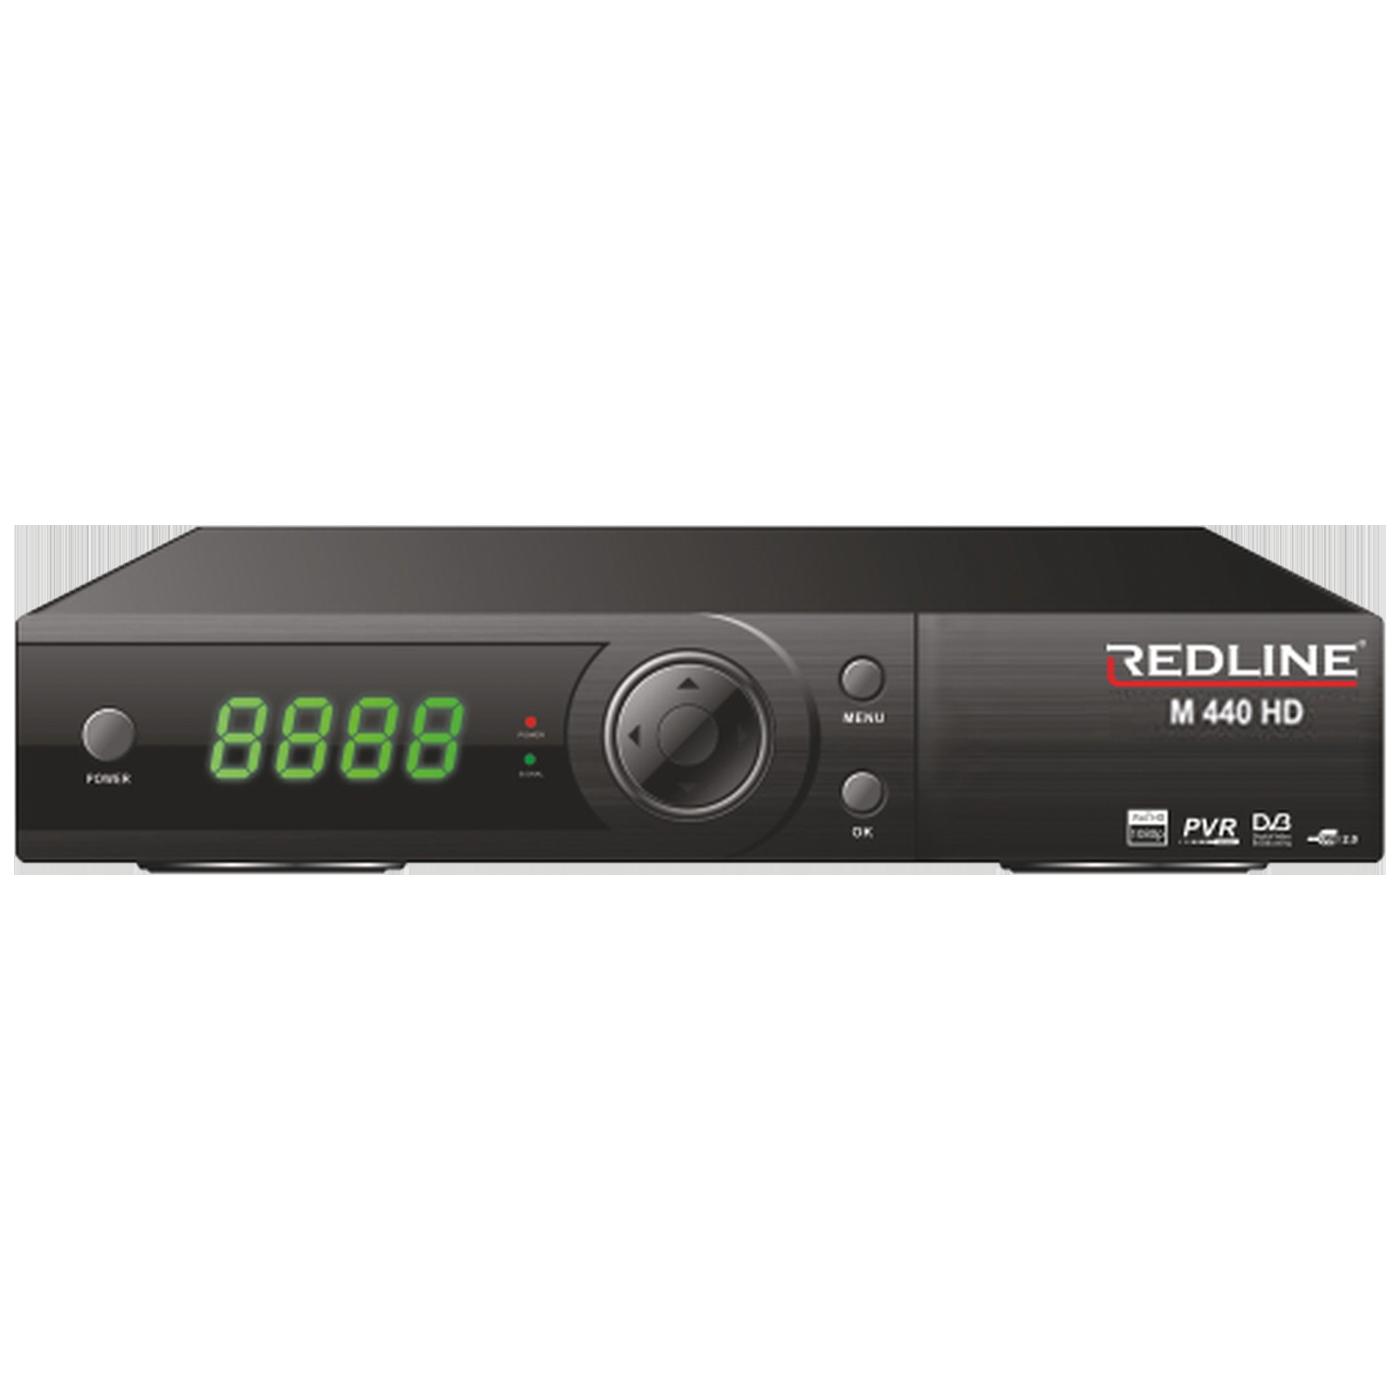 REDLINE - M440HD